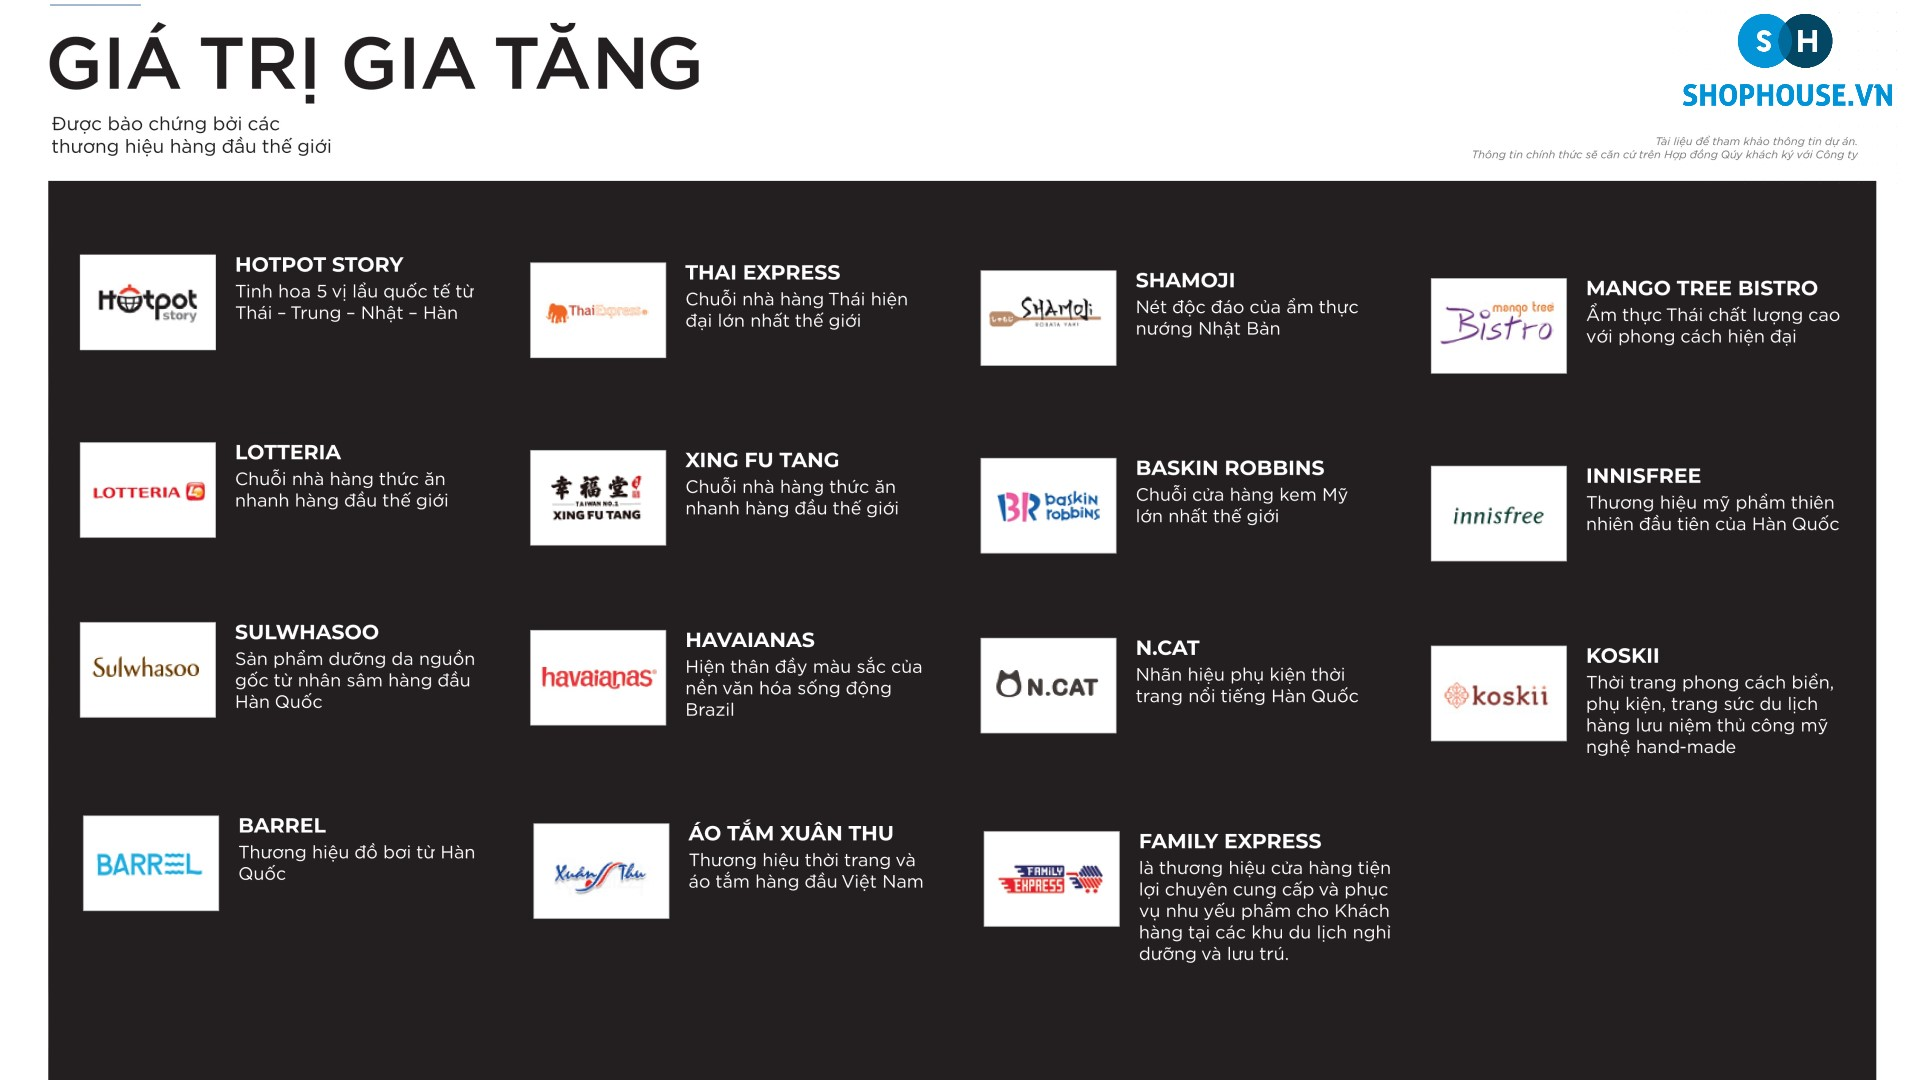 cac-thuong-hieu-tham-gia-van-hanh-shophouse-novaworld-cho-thue-kinh-doanh-fb